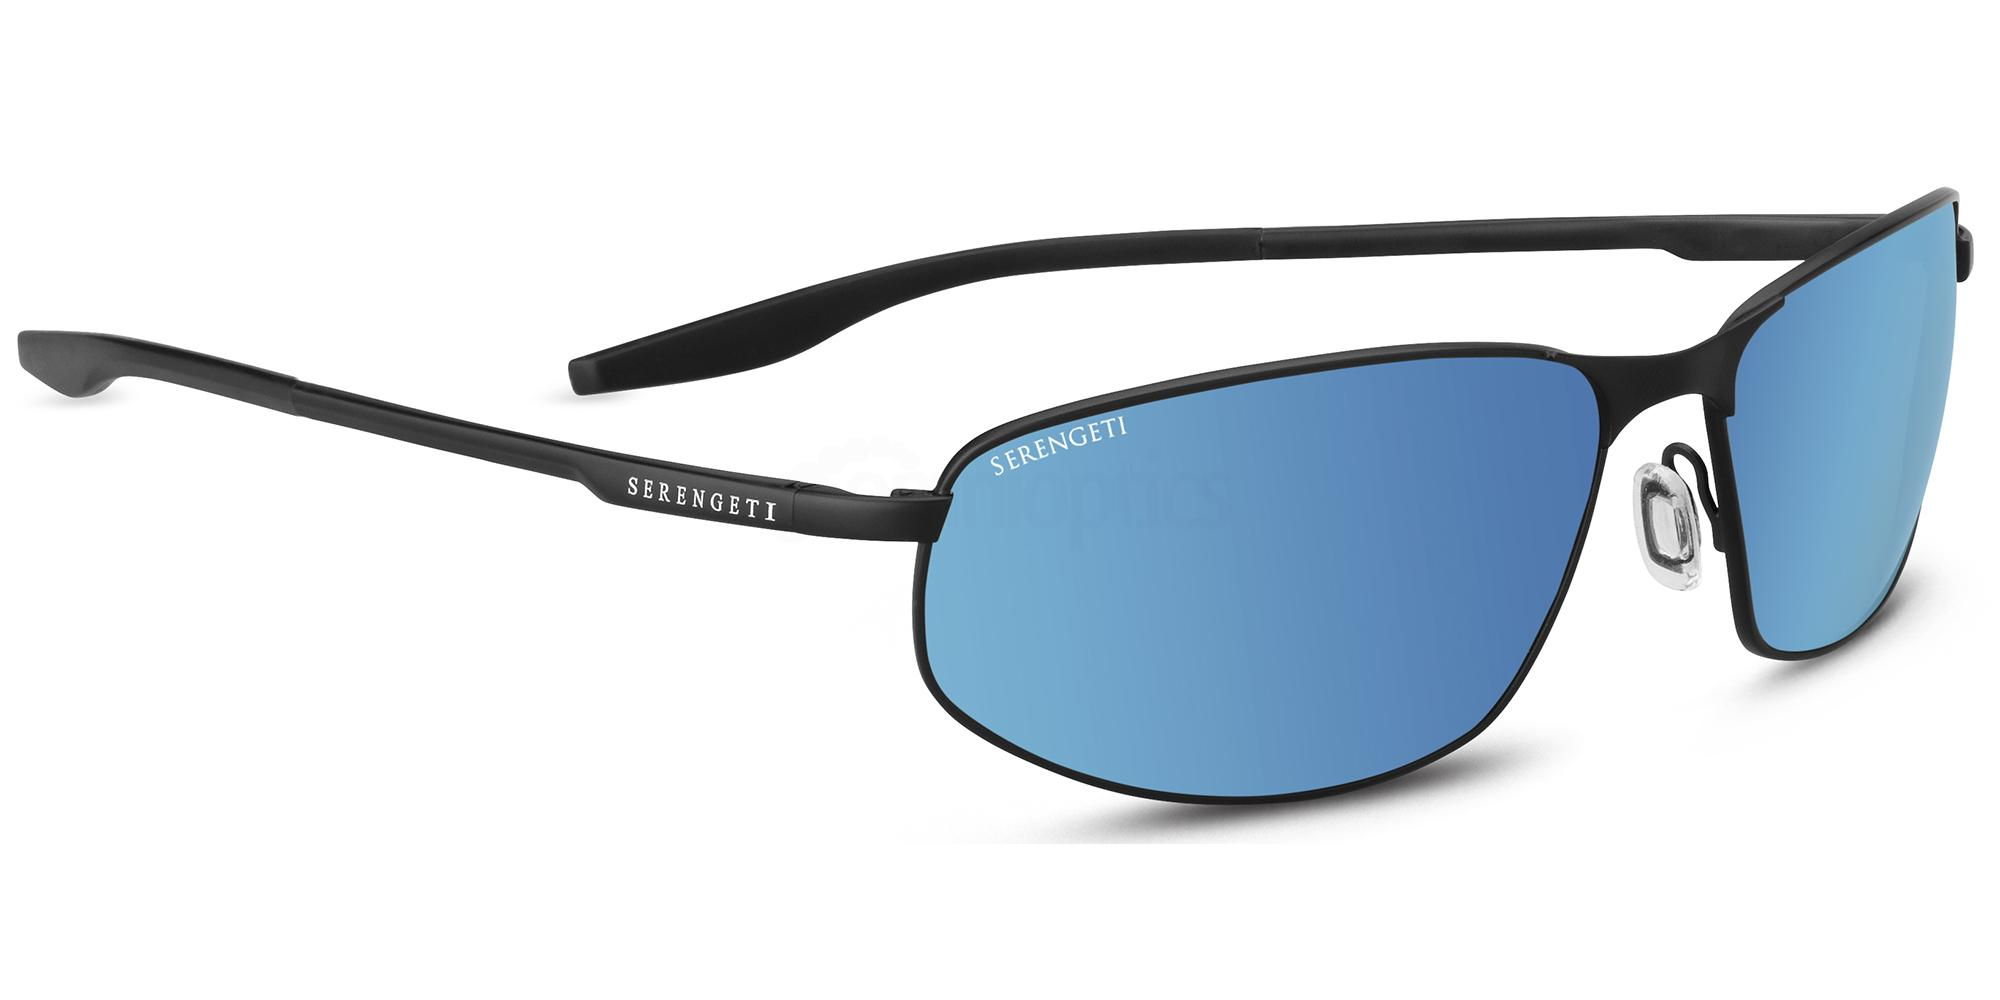 8729 MATERA LARGE Sunglasses, Serengeti